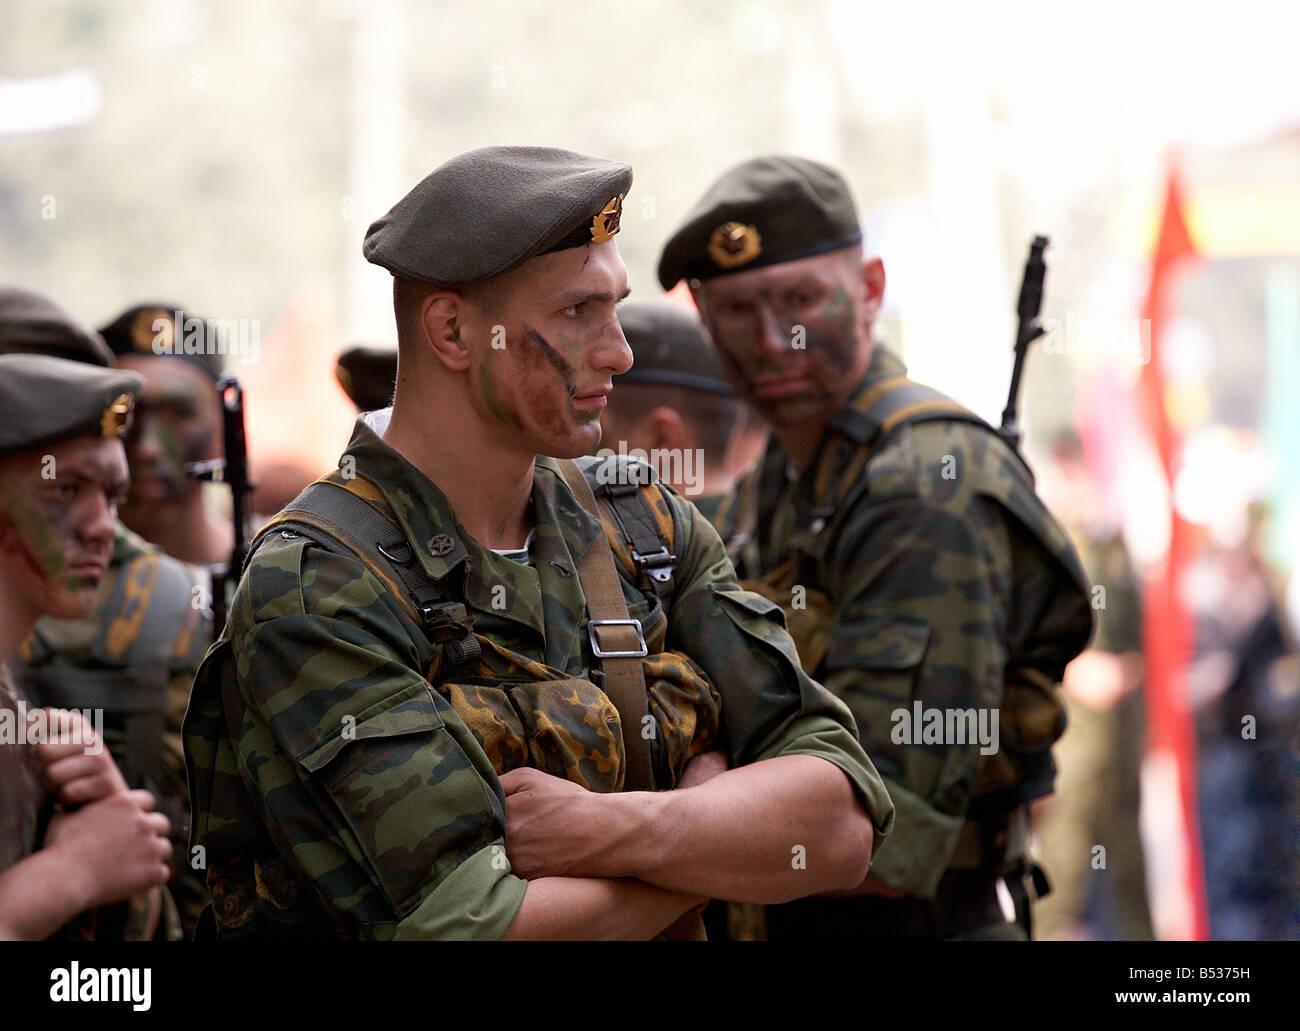 Army Ranger Stock Photos & Army Ranger Stock Images